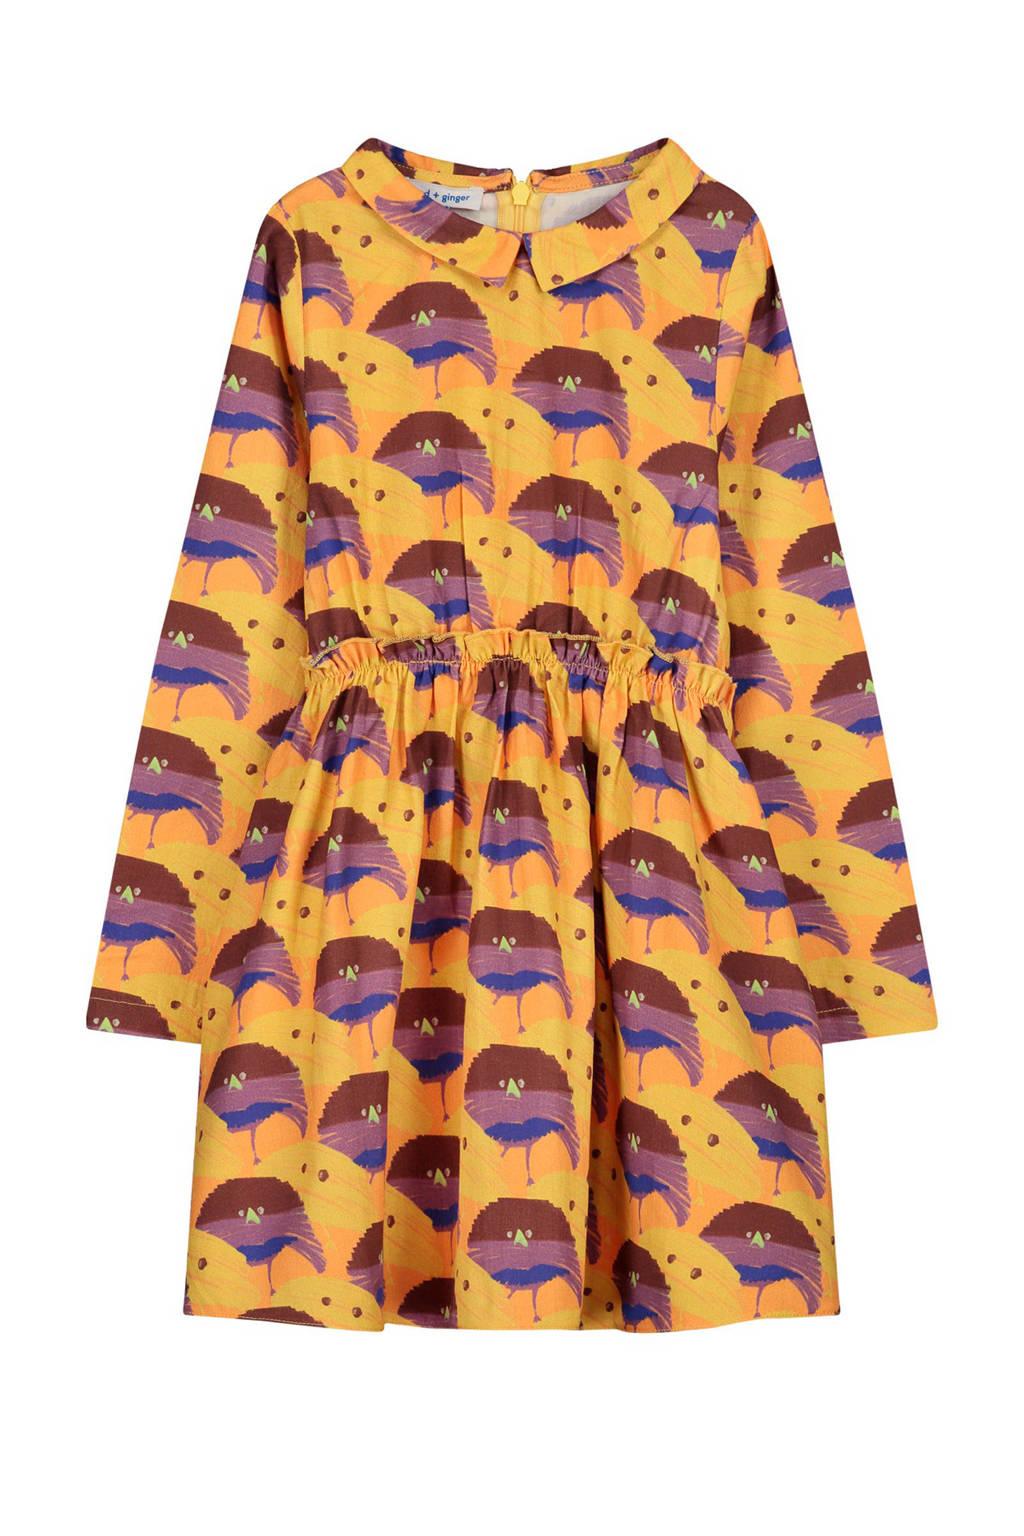 fred + ginger jurk Tinka met all over print oranje/paars/blauw, Oranje/paars/blauw